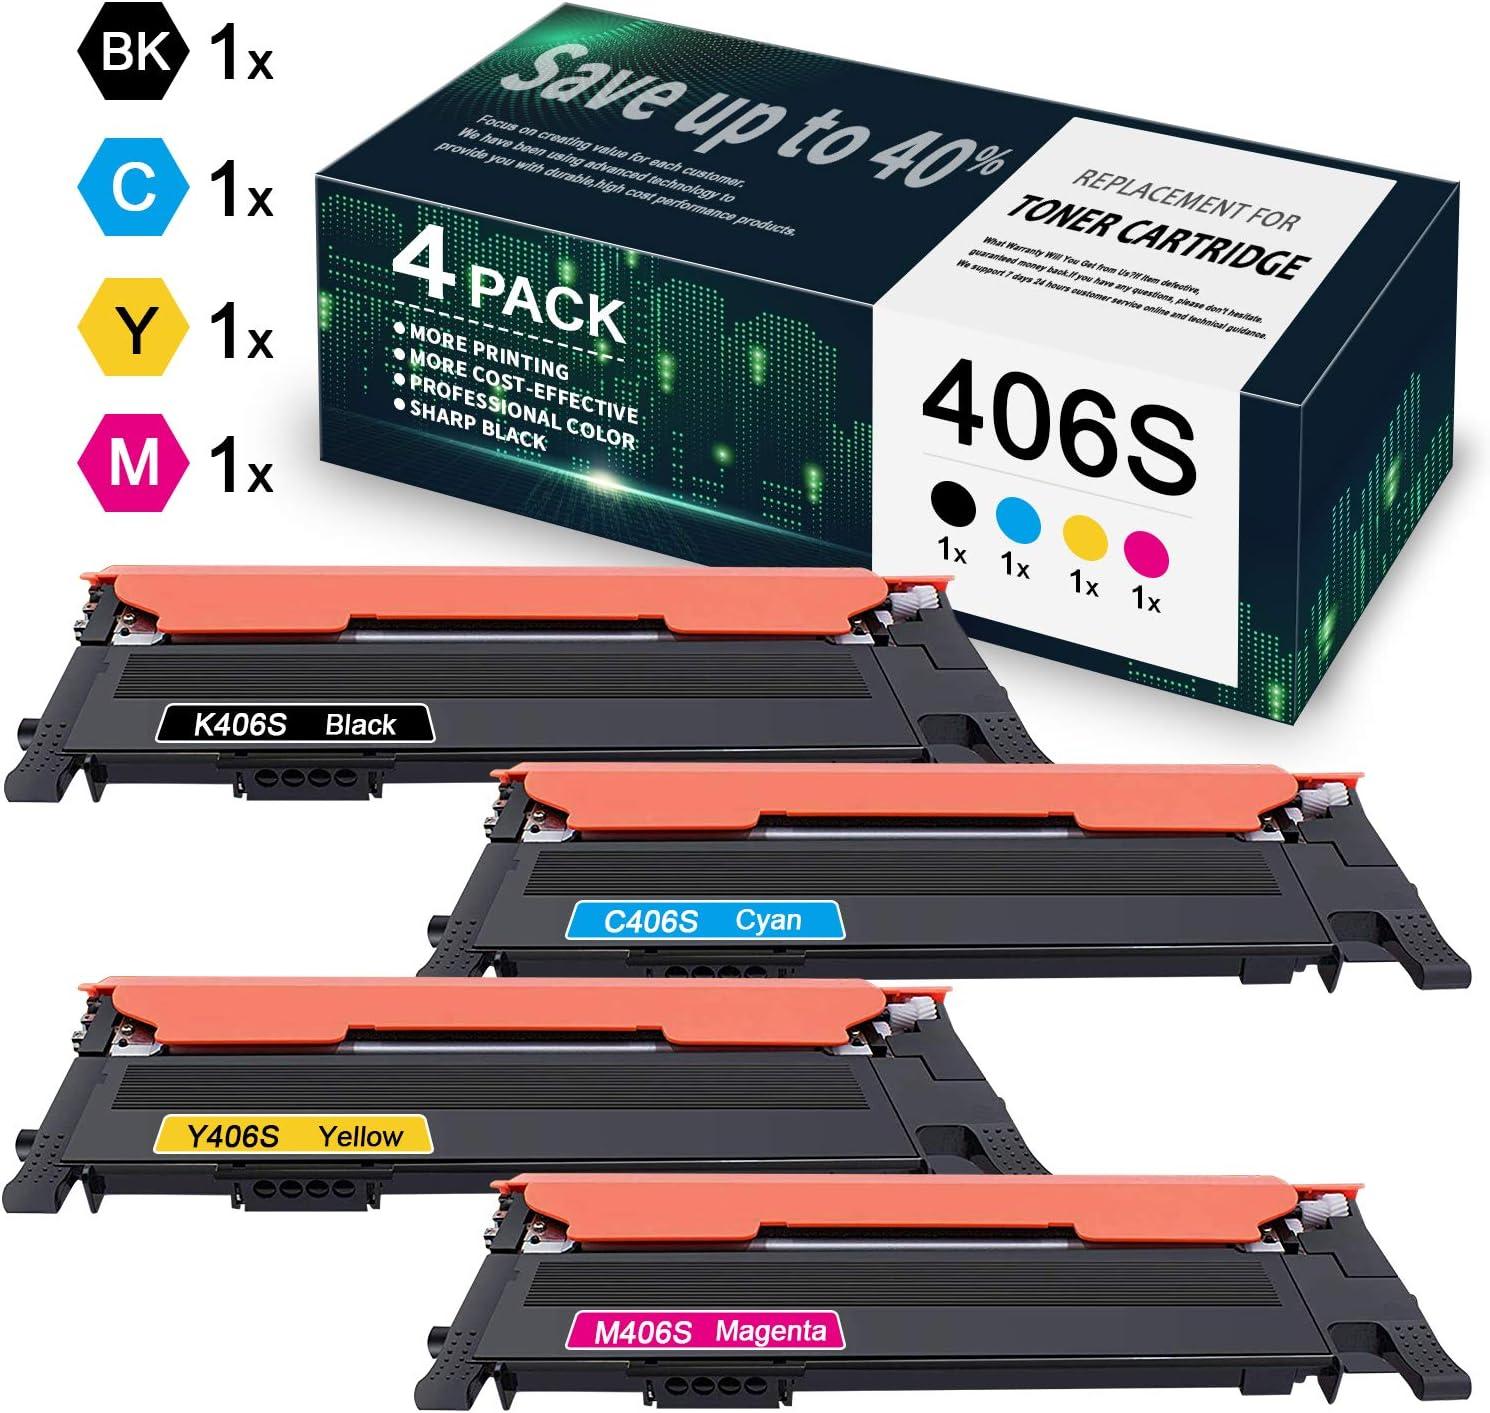 thegymyarraville.com.au 4 Pack 1BK+1C+1M+1Y 406S K406S C406S M406S ...